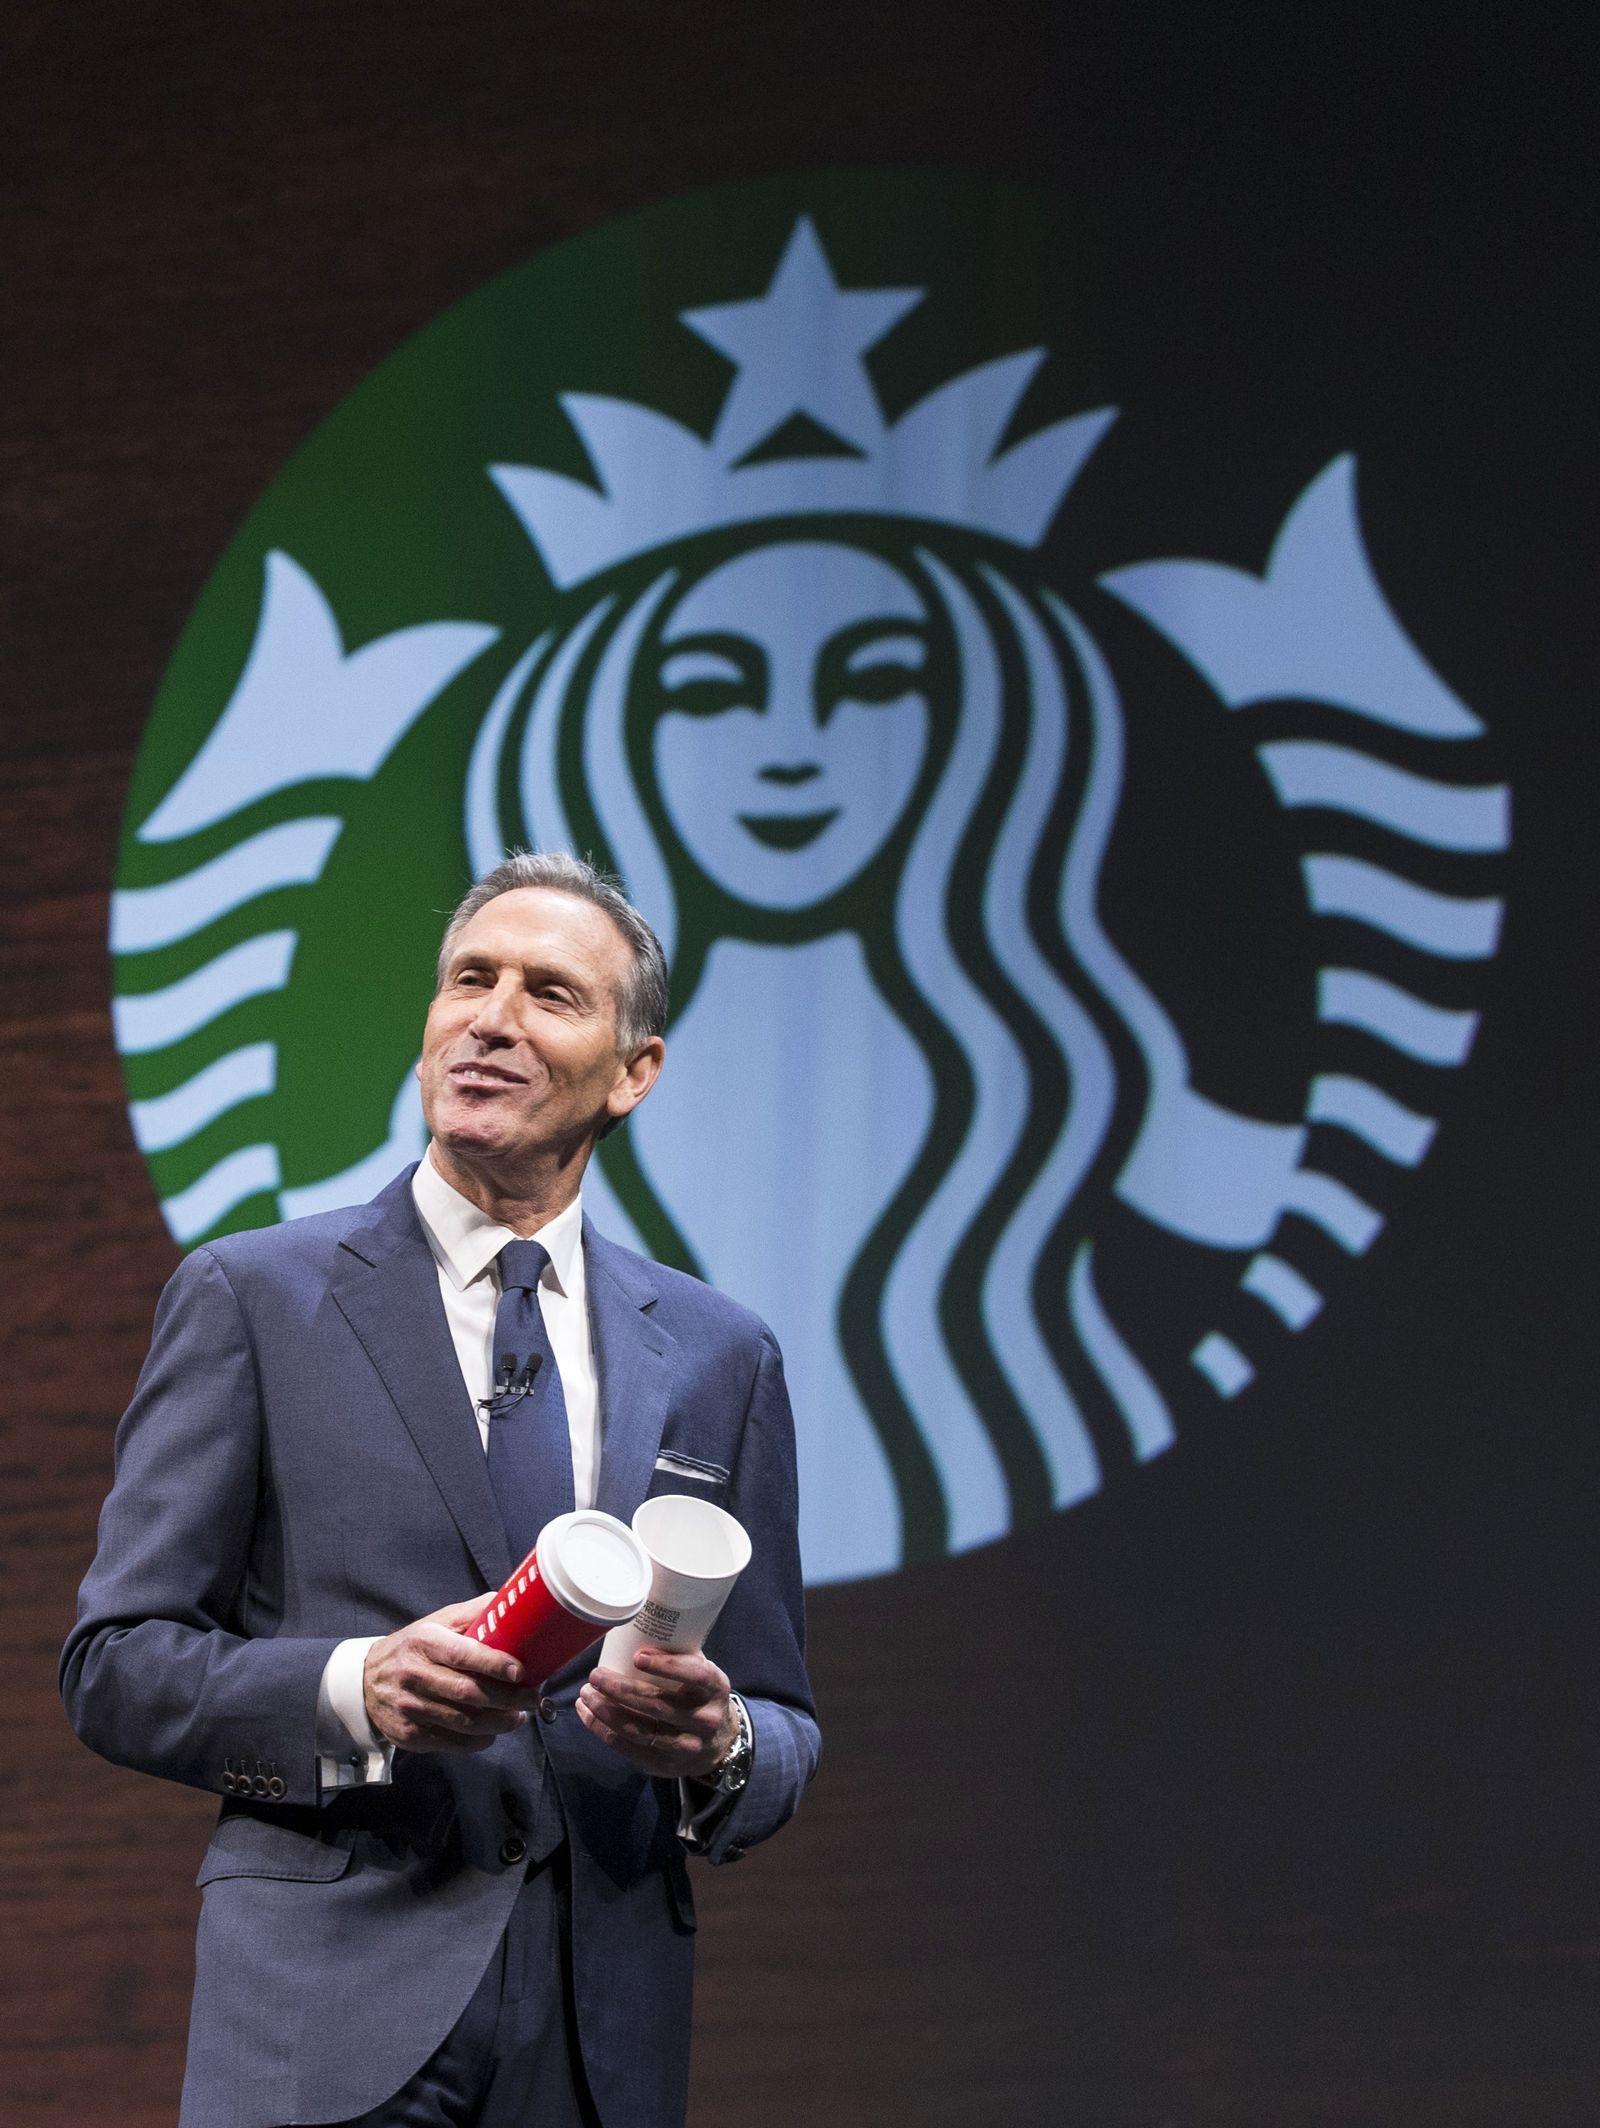 Howard Schultz / Starbucks